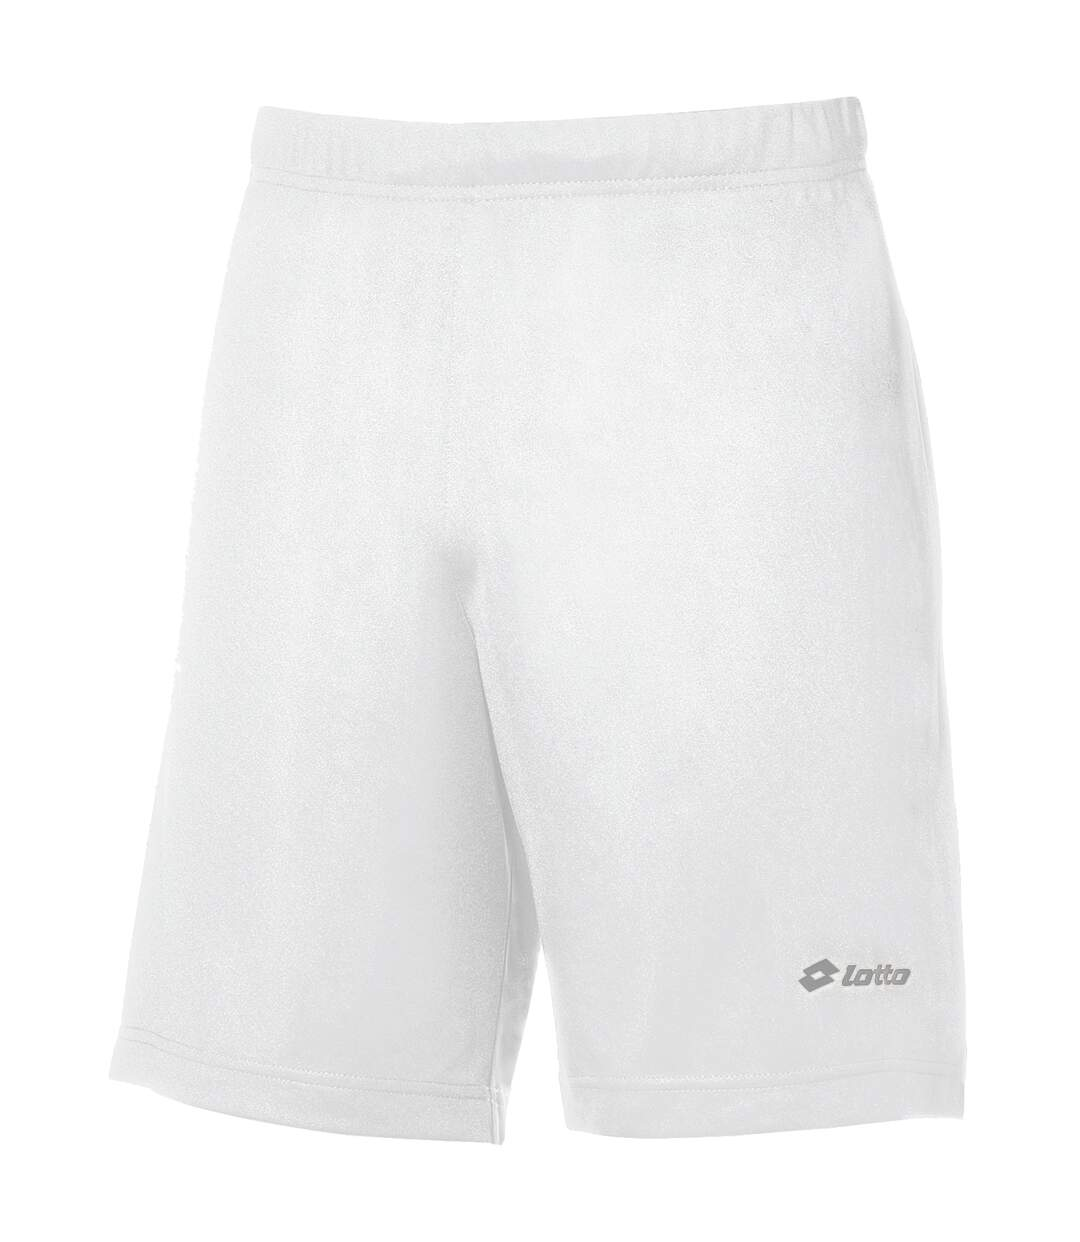 Lotto Mens Football Omega Short Sports (Navy) - UTRW2071